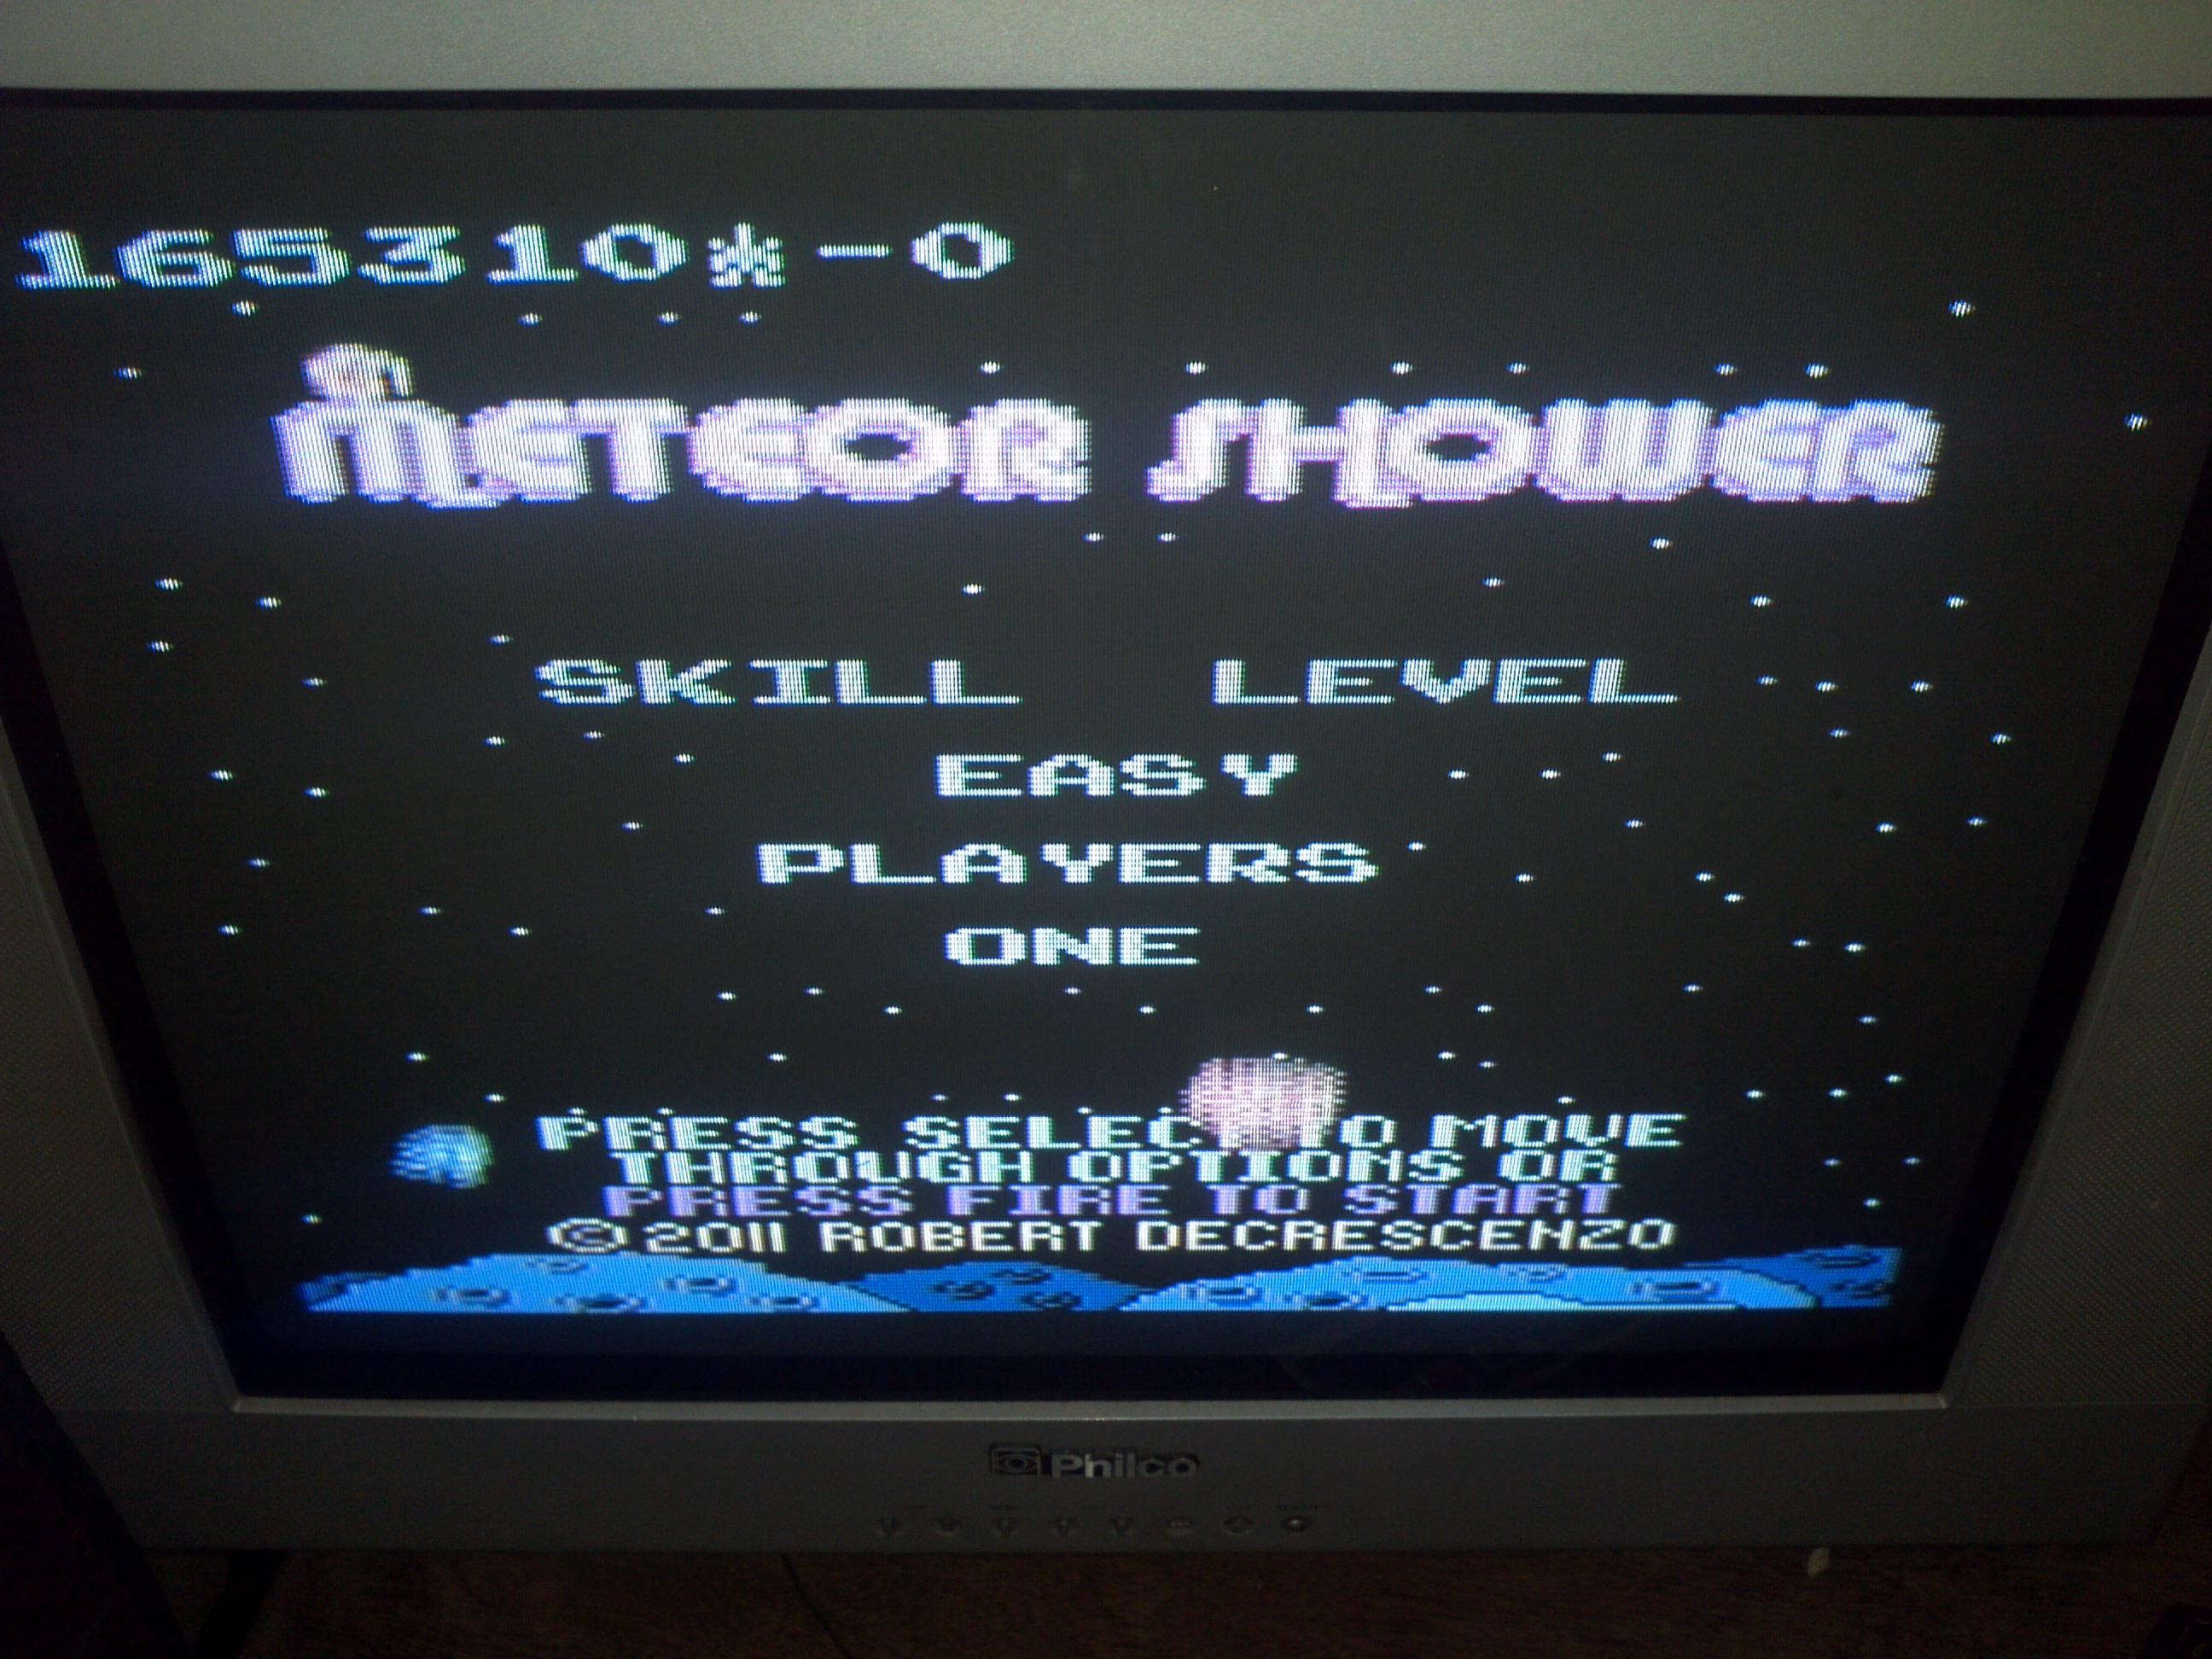 Liduario: Meteor Shower: Easy (Atari 7800) 165,310 points on 2014-09-26 10:41:39